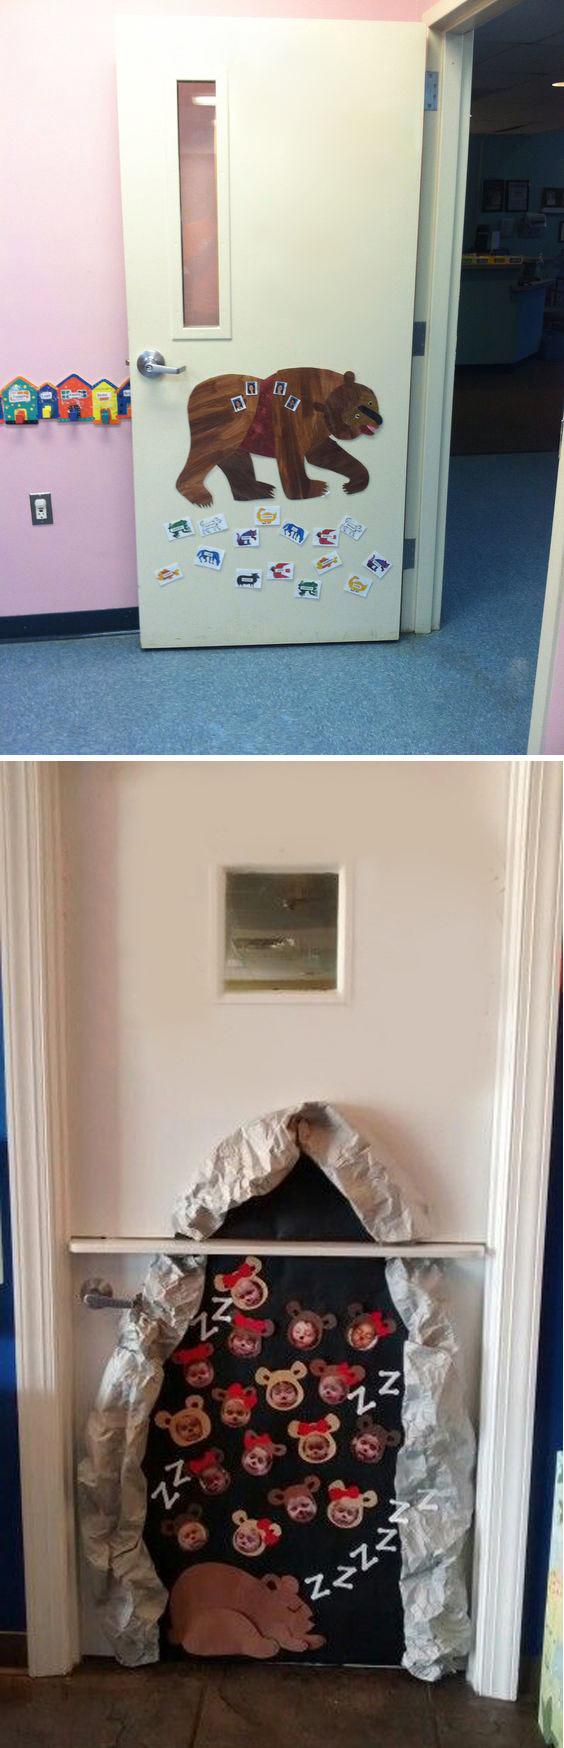 门饰.jpg